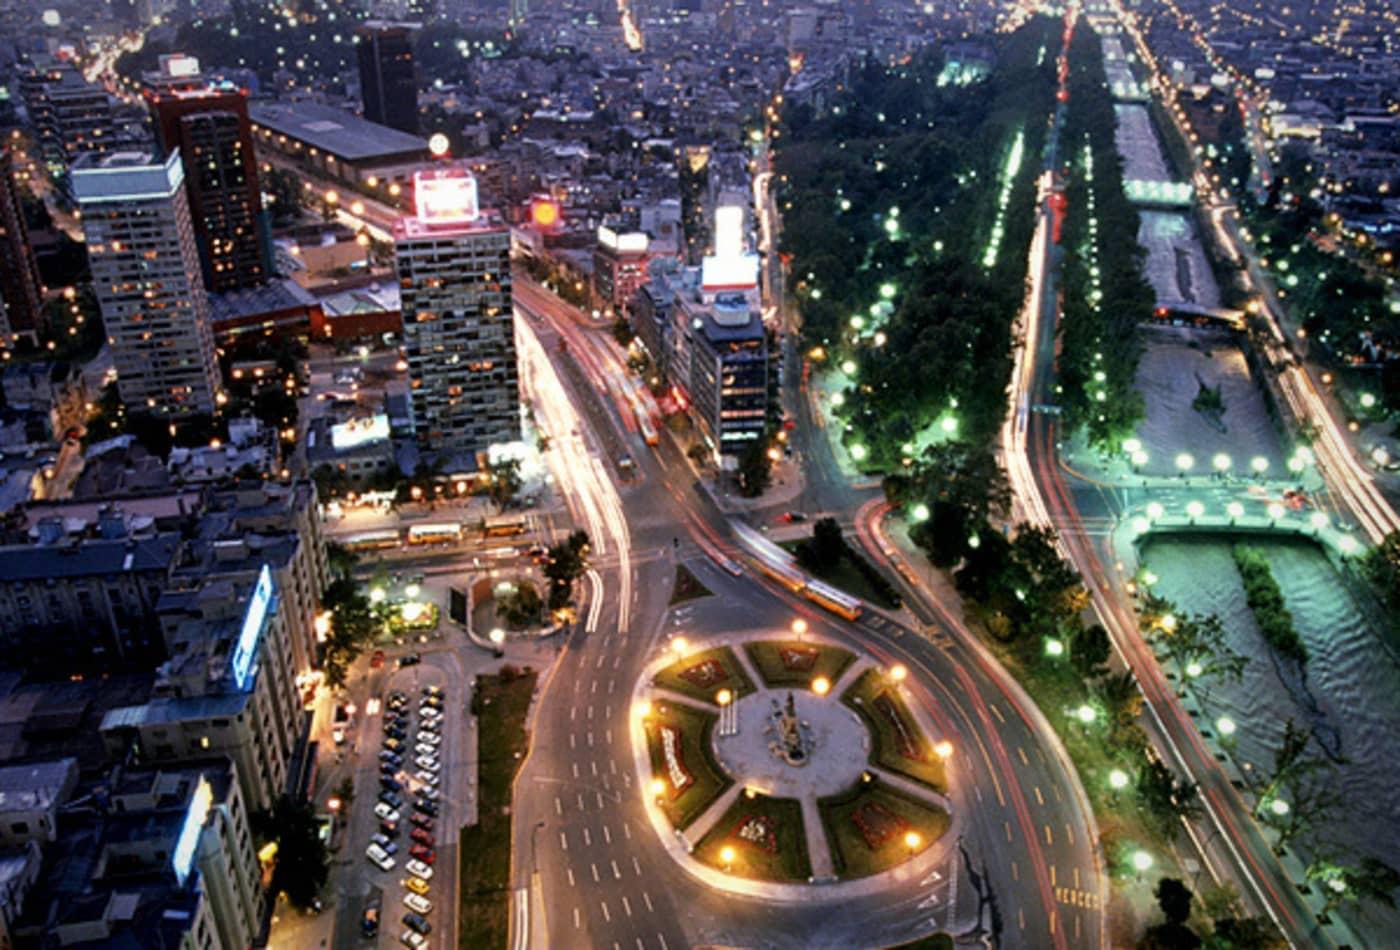 Retails-hottest-emerging-markets-2012-chile.jpg